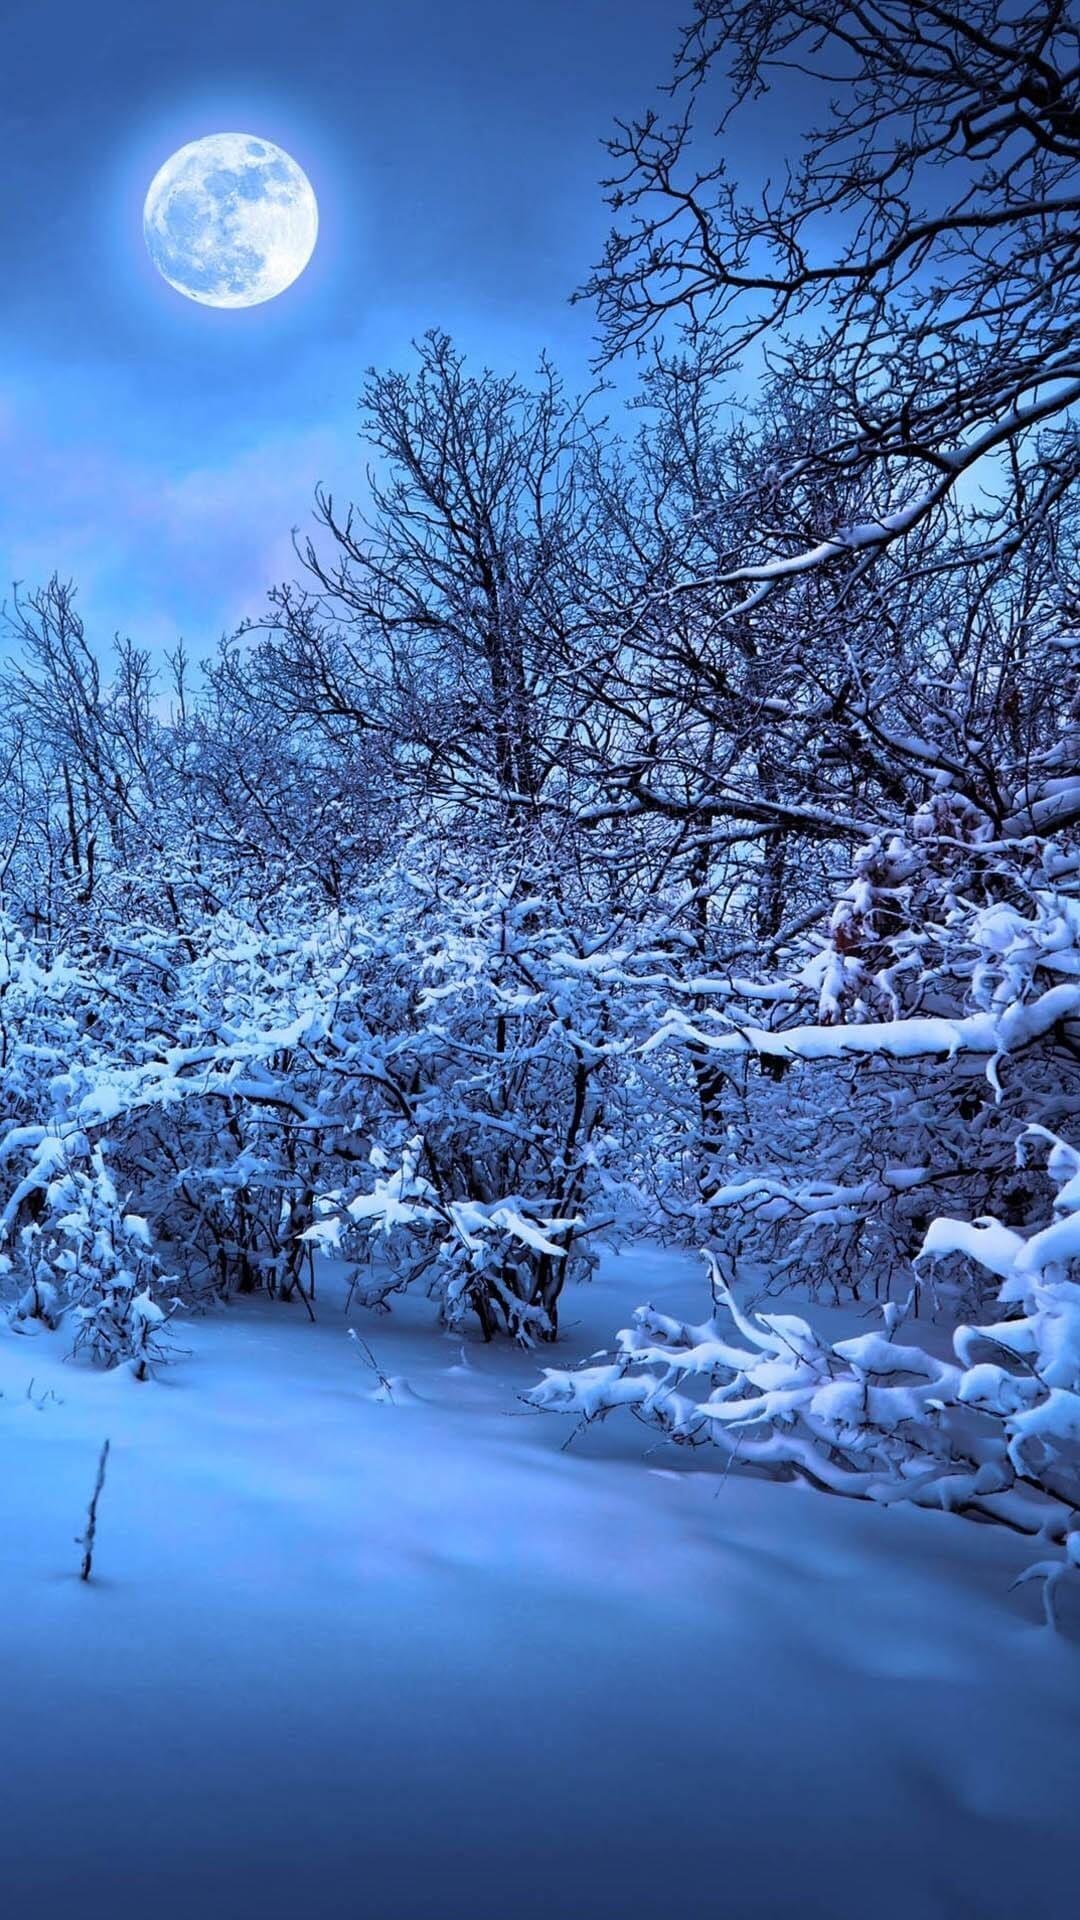 Winter Night Phone Wallpapers - Top ...